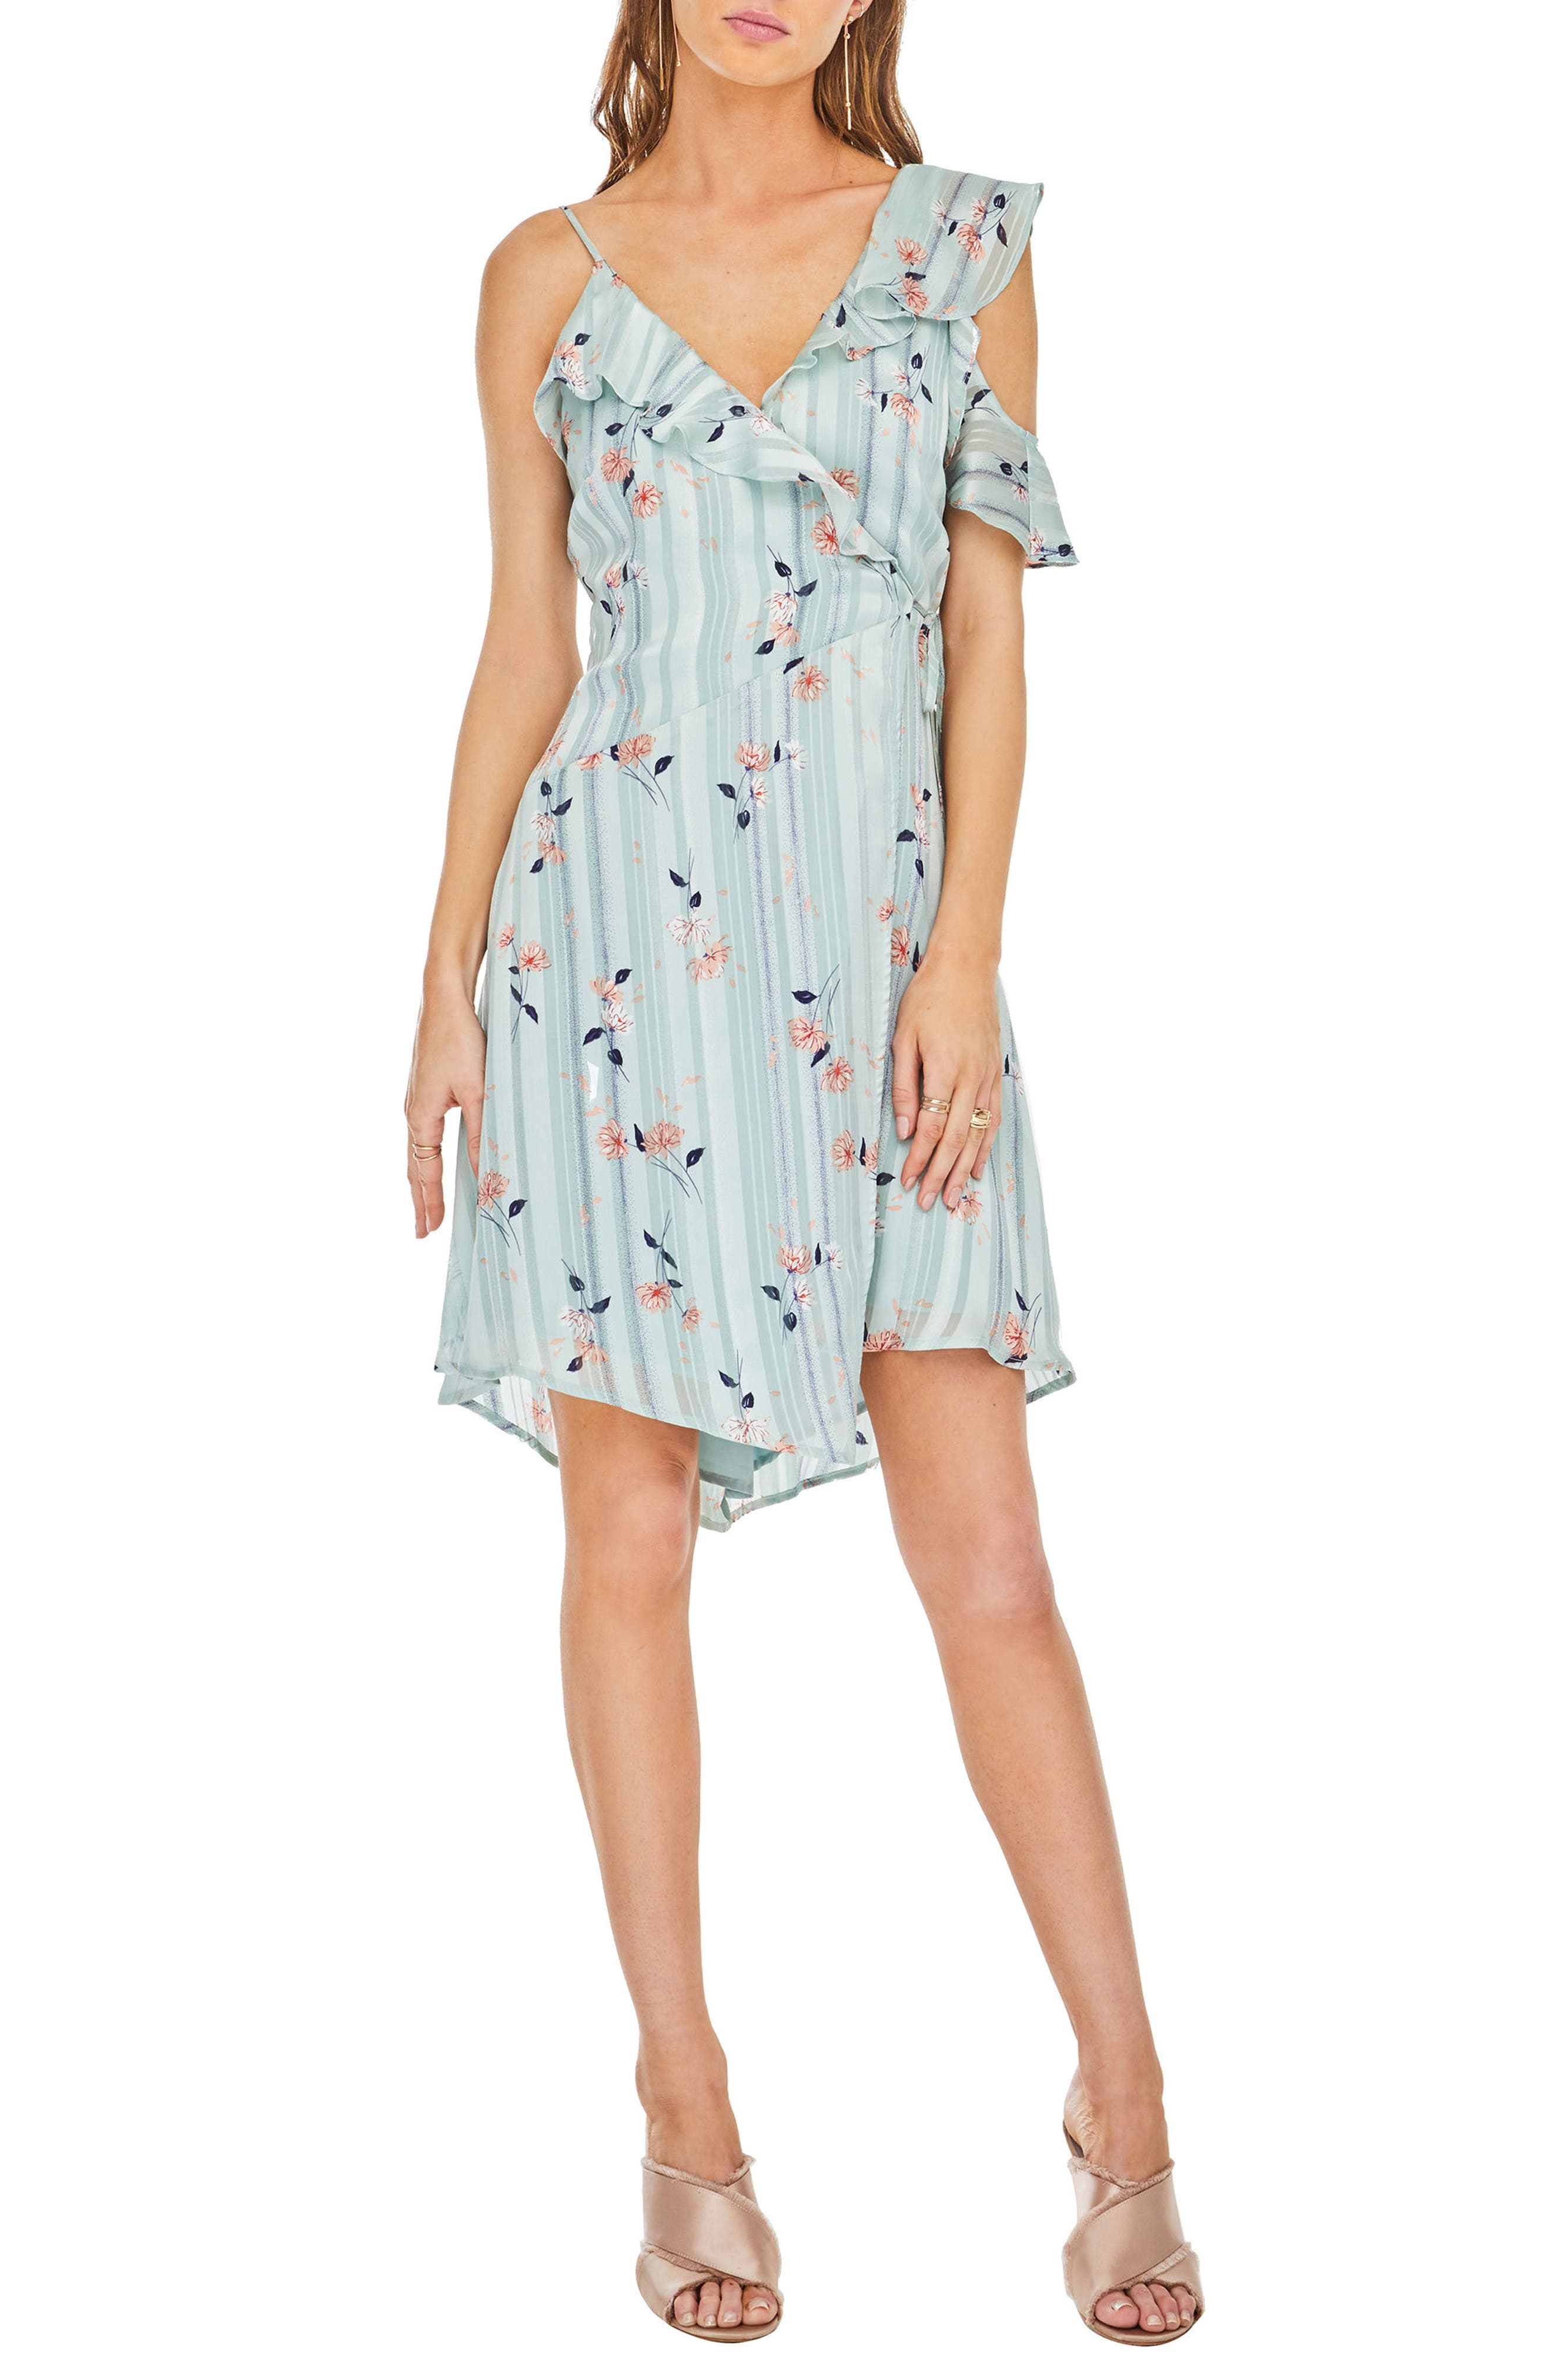 Josie Ruffle Dress,                             Main thumbnail 1, color,                             Mint Satin Floral